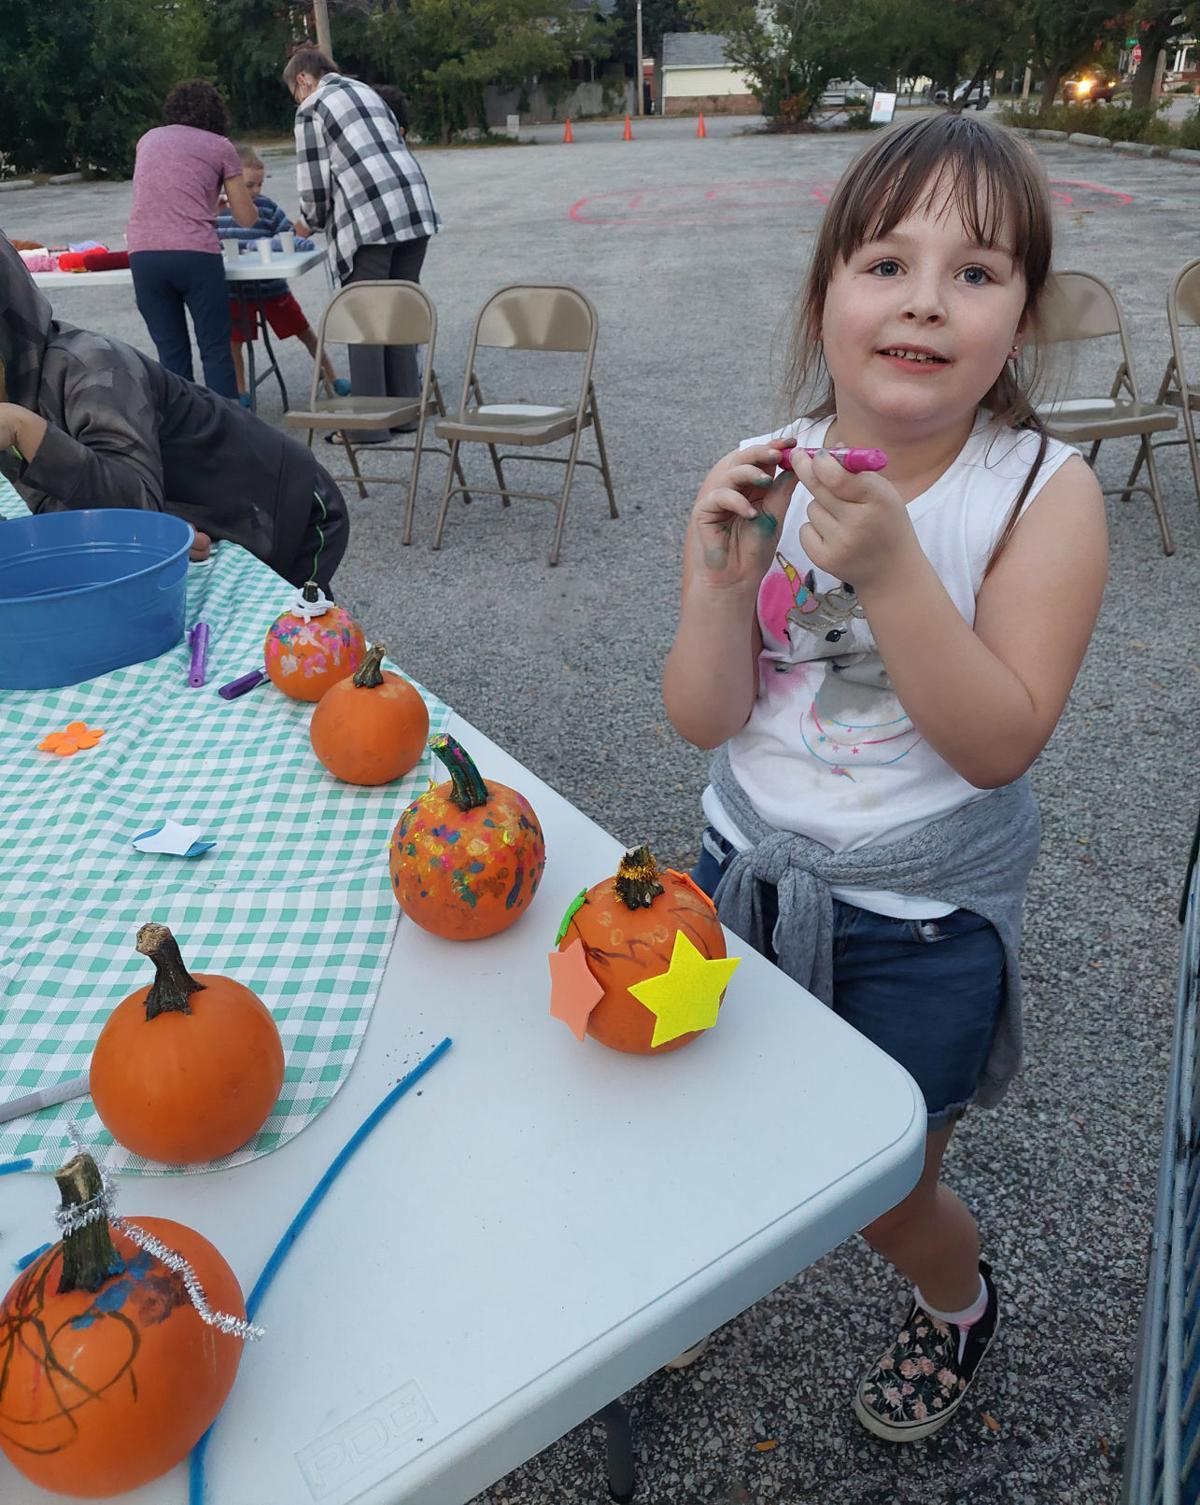 Pumpkin photo 1